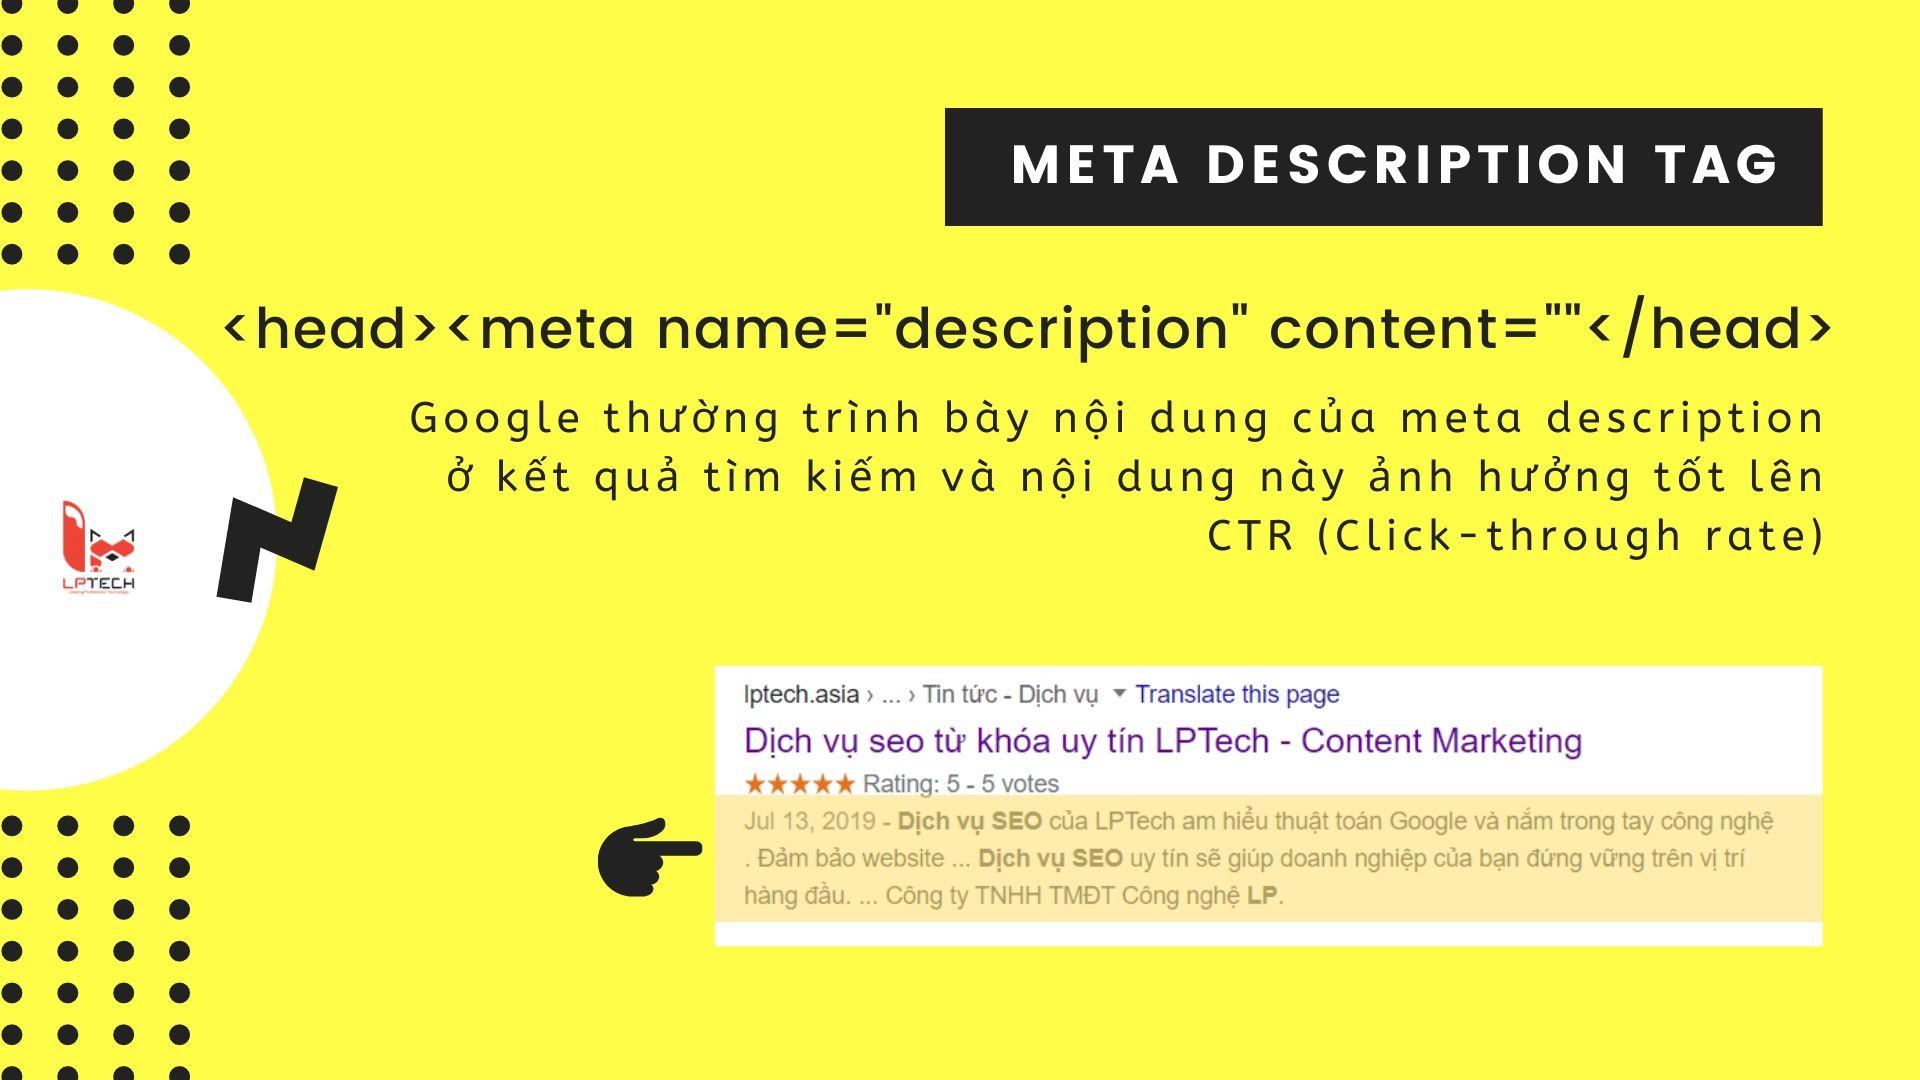 Cách sử dụng meta description tag